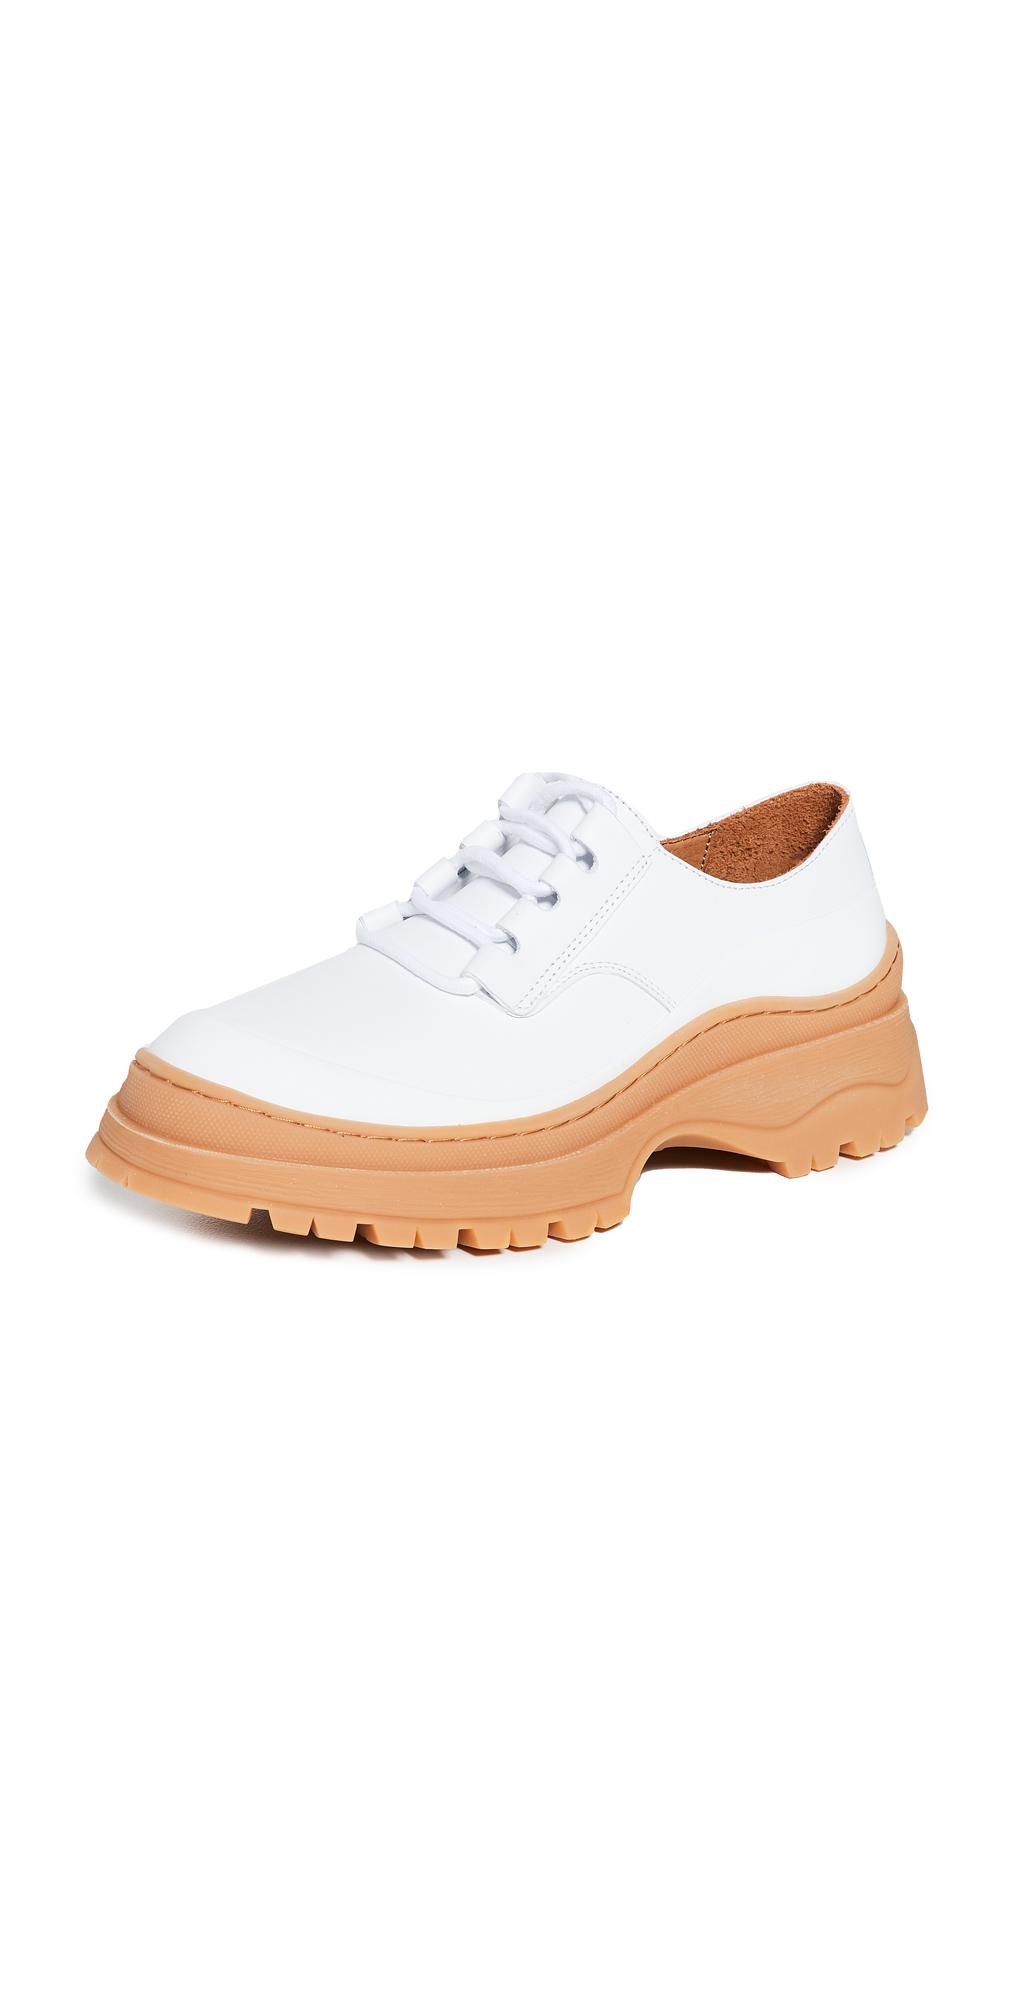 Rachel Comey Lovett Shoes